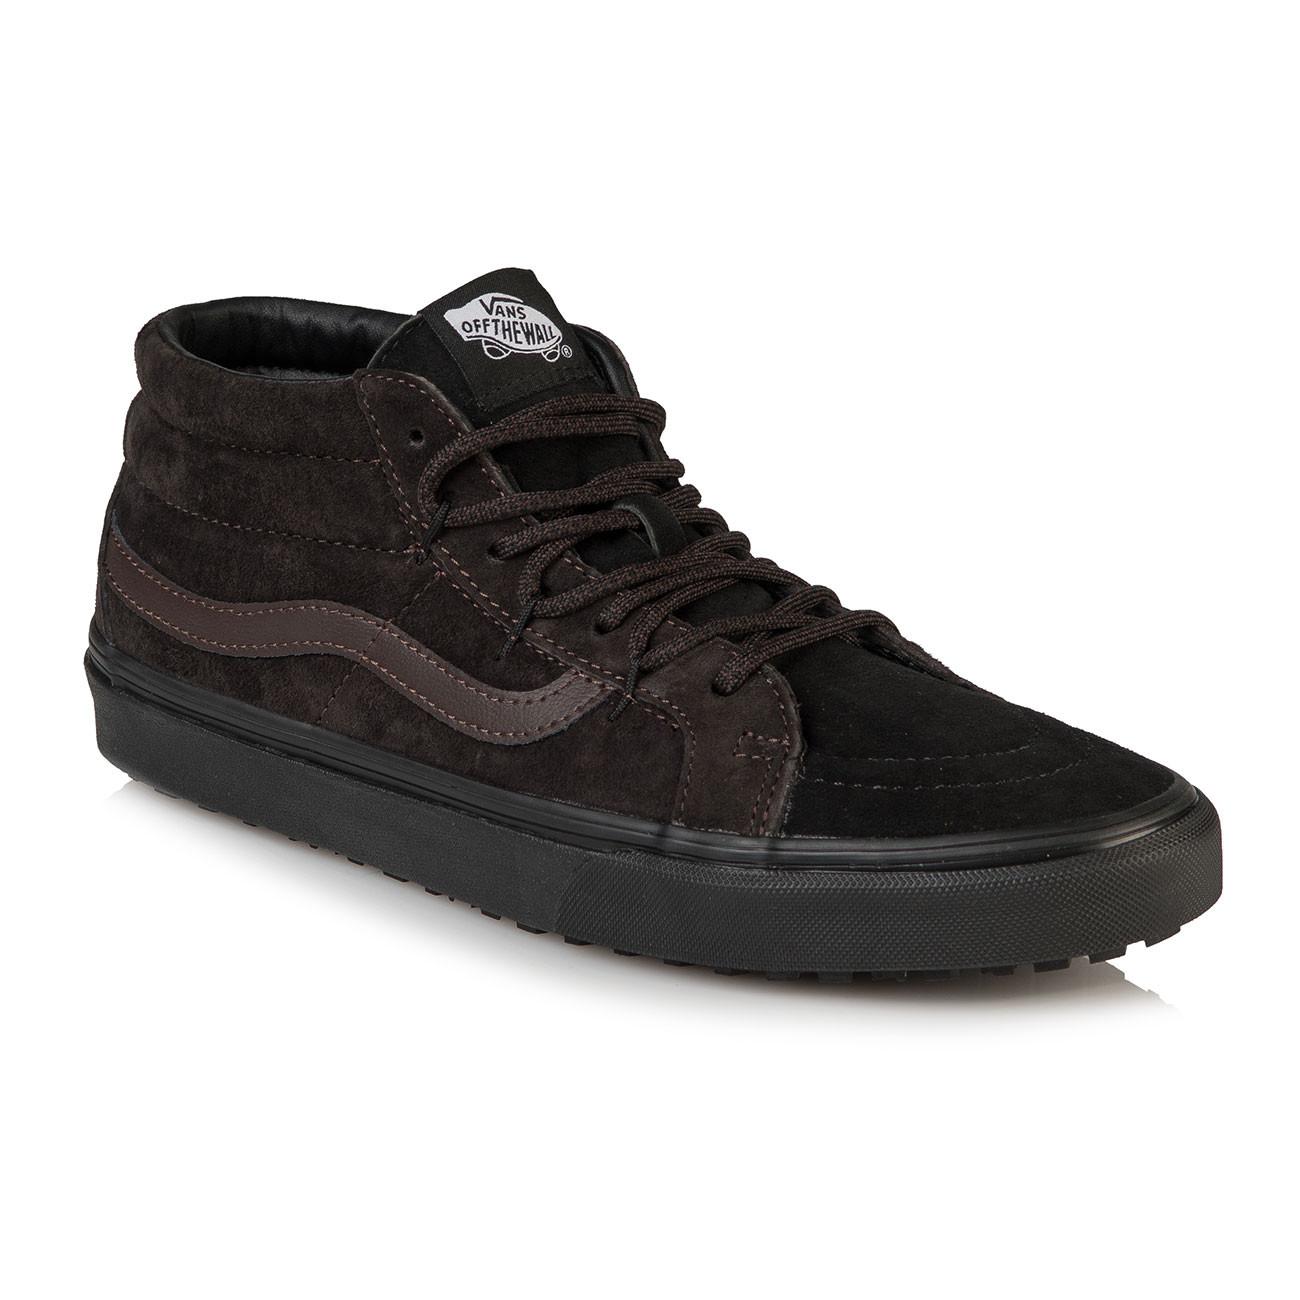 Winter shoes Vans Sk8-Mid Reissue